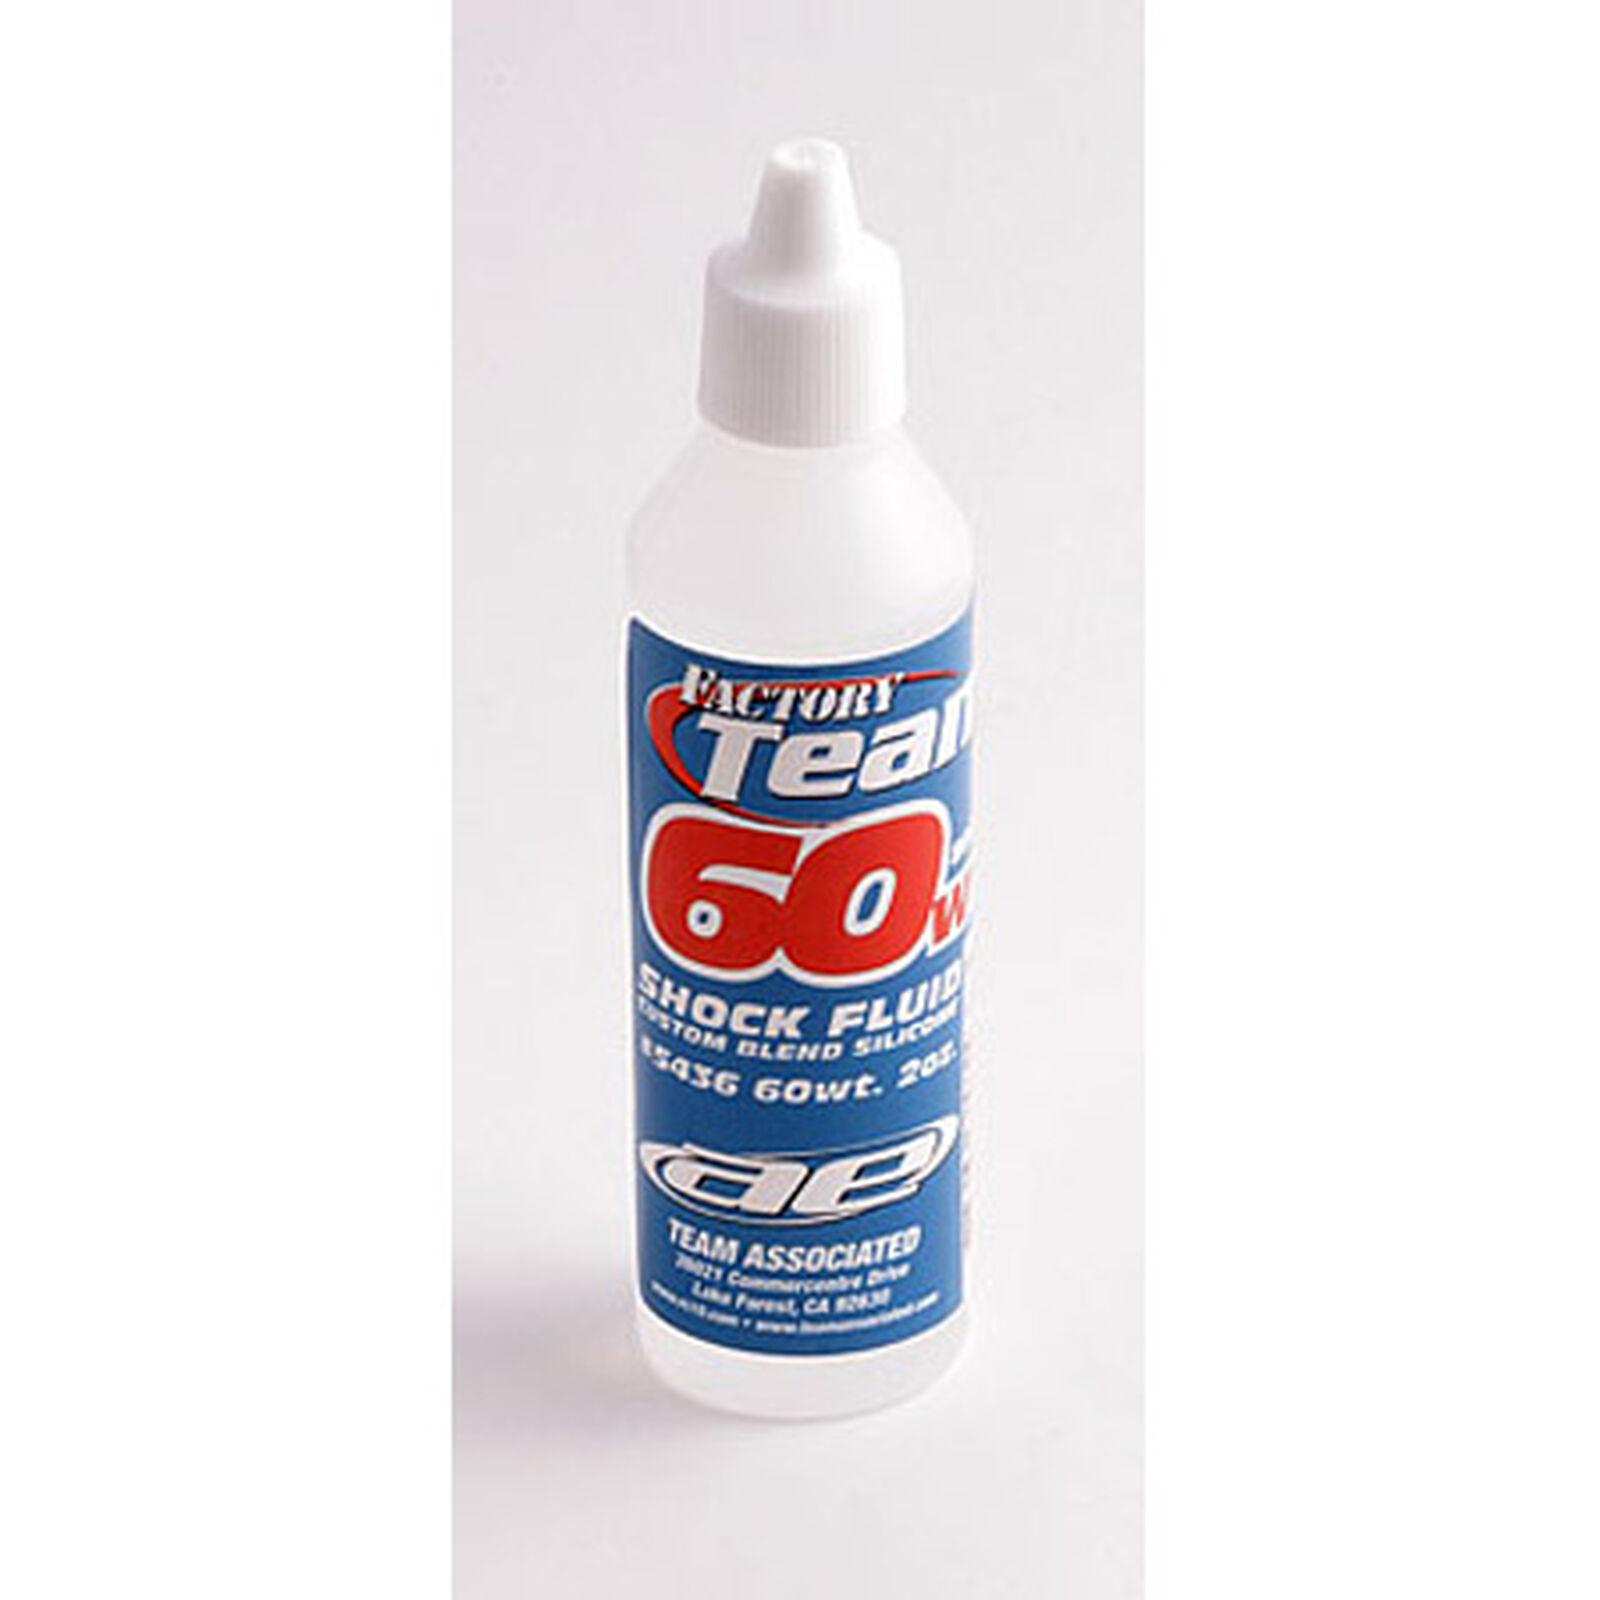 Factory Team Silicone Shock Fluid, 60Wt (800 cSt) 2oz